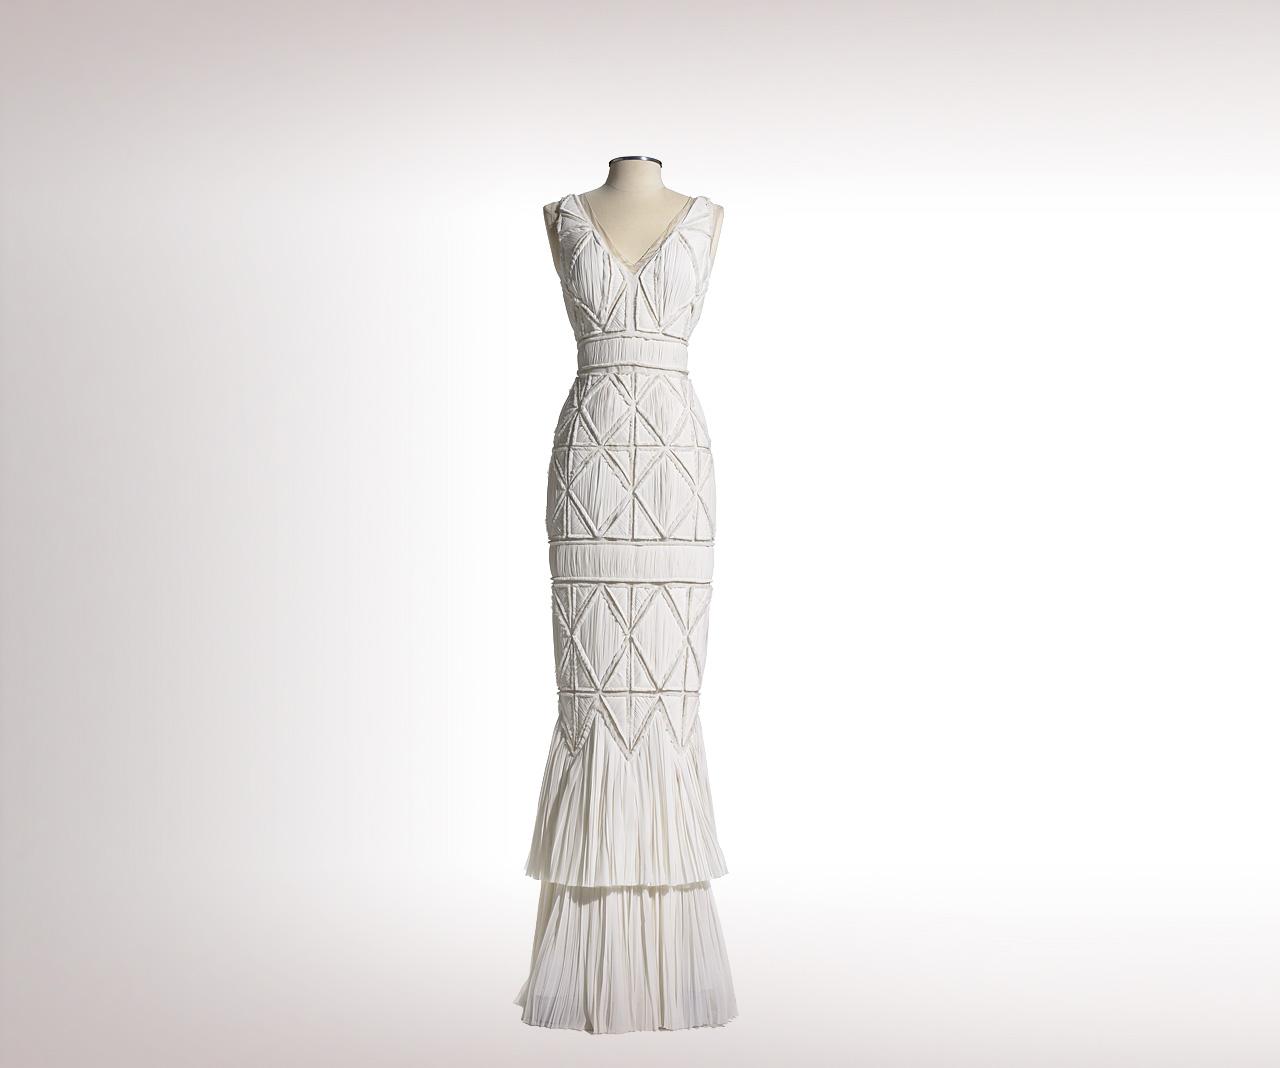 j mendel 2014 wedding gowns (17) | The FashionBrides